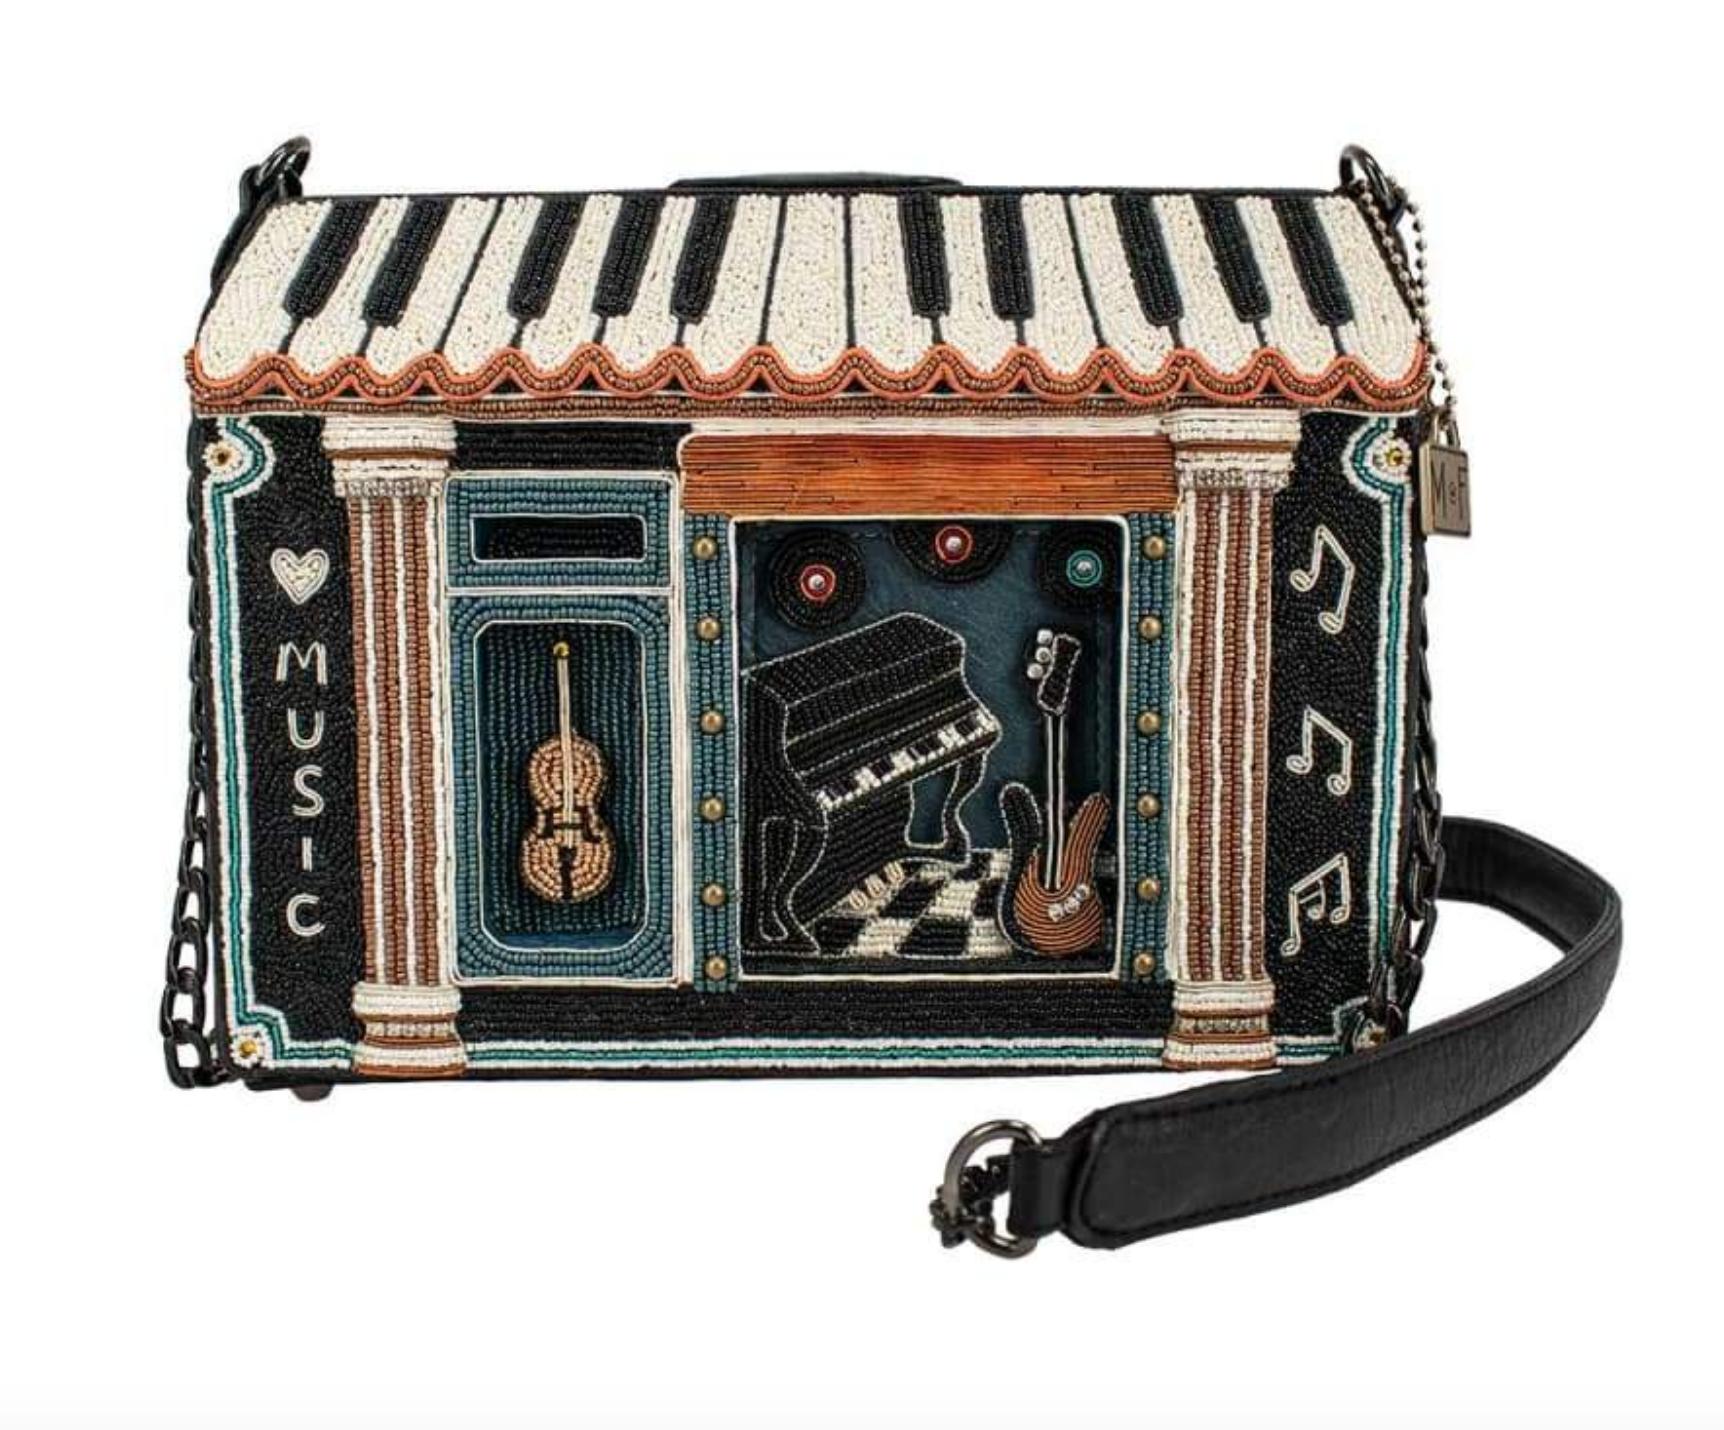 Mary Frances Mary Frances - Music Shop Handbag